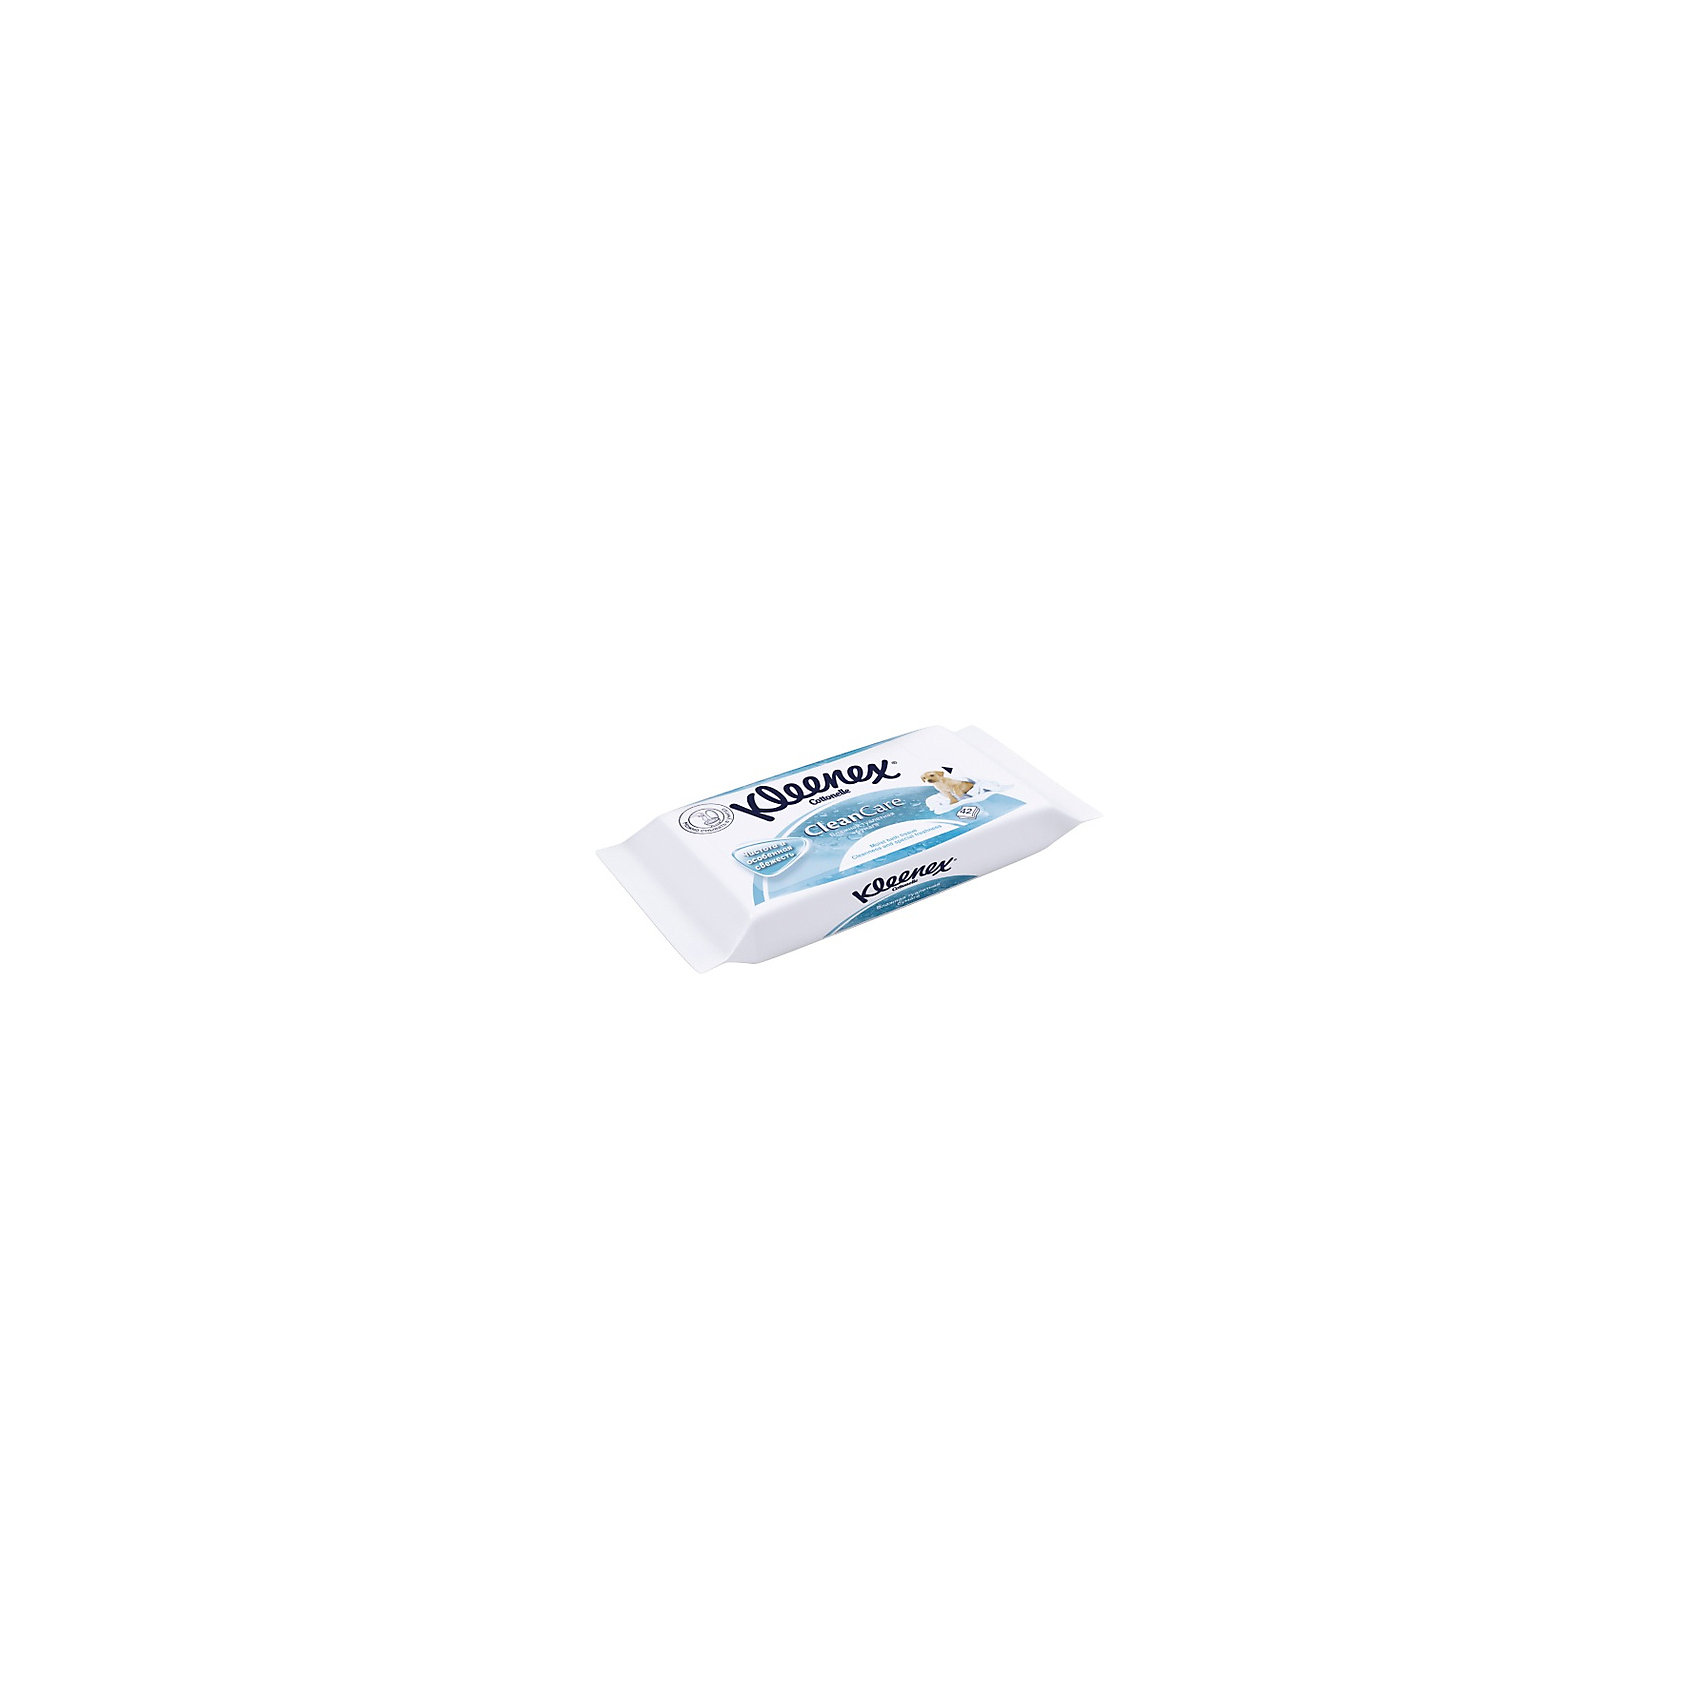 Kleenex Влажная туалетная бумага запасной блок 42 шт., Kleenex fria влажная туалетная бумага umidificata sensitive care био разлогаемая 12 шт уп